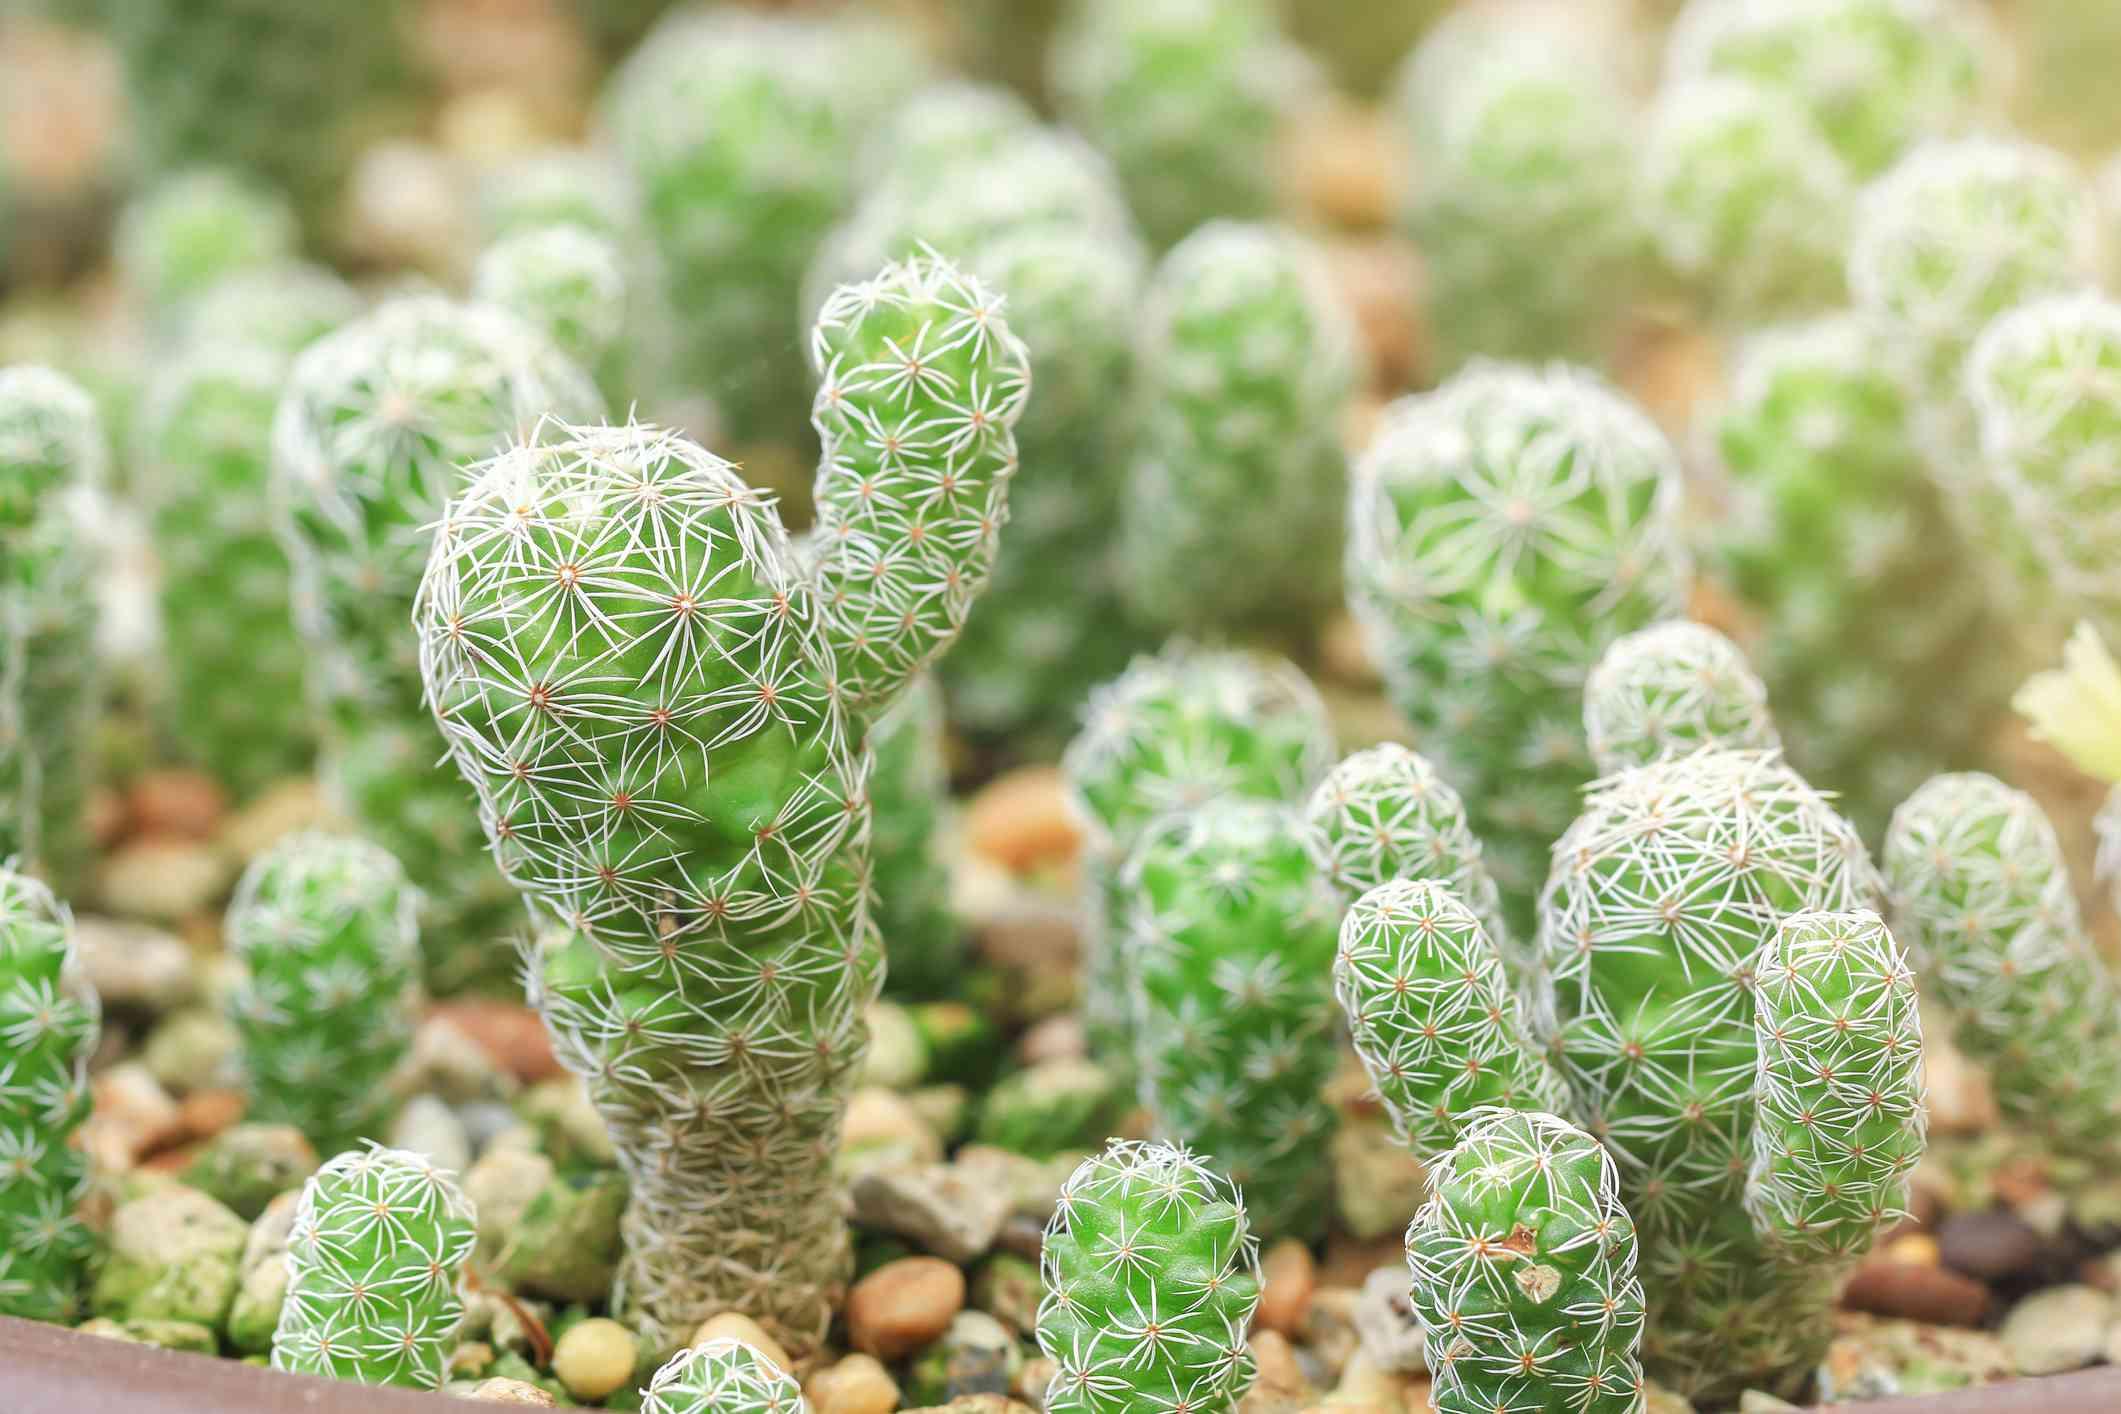 Thimble cacti in a pot